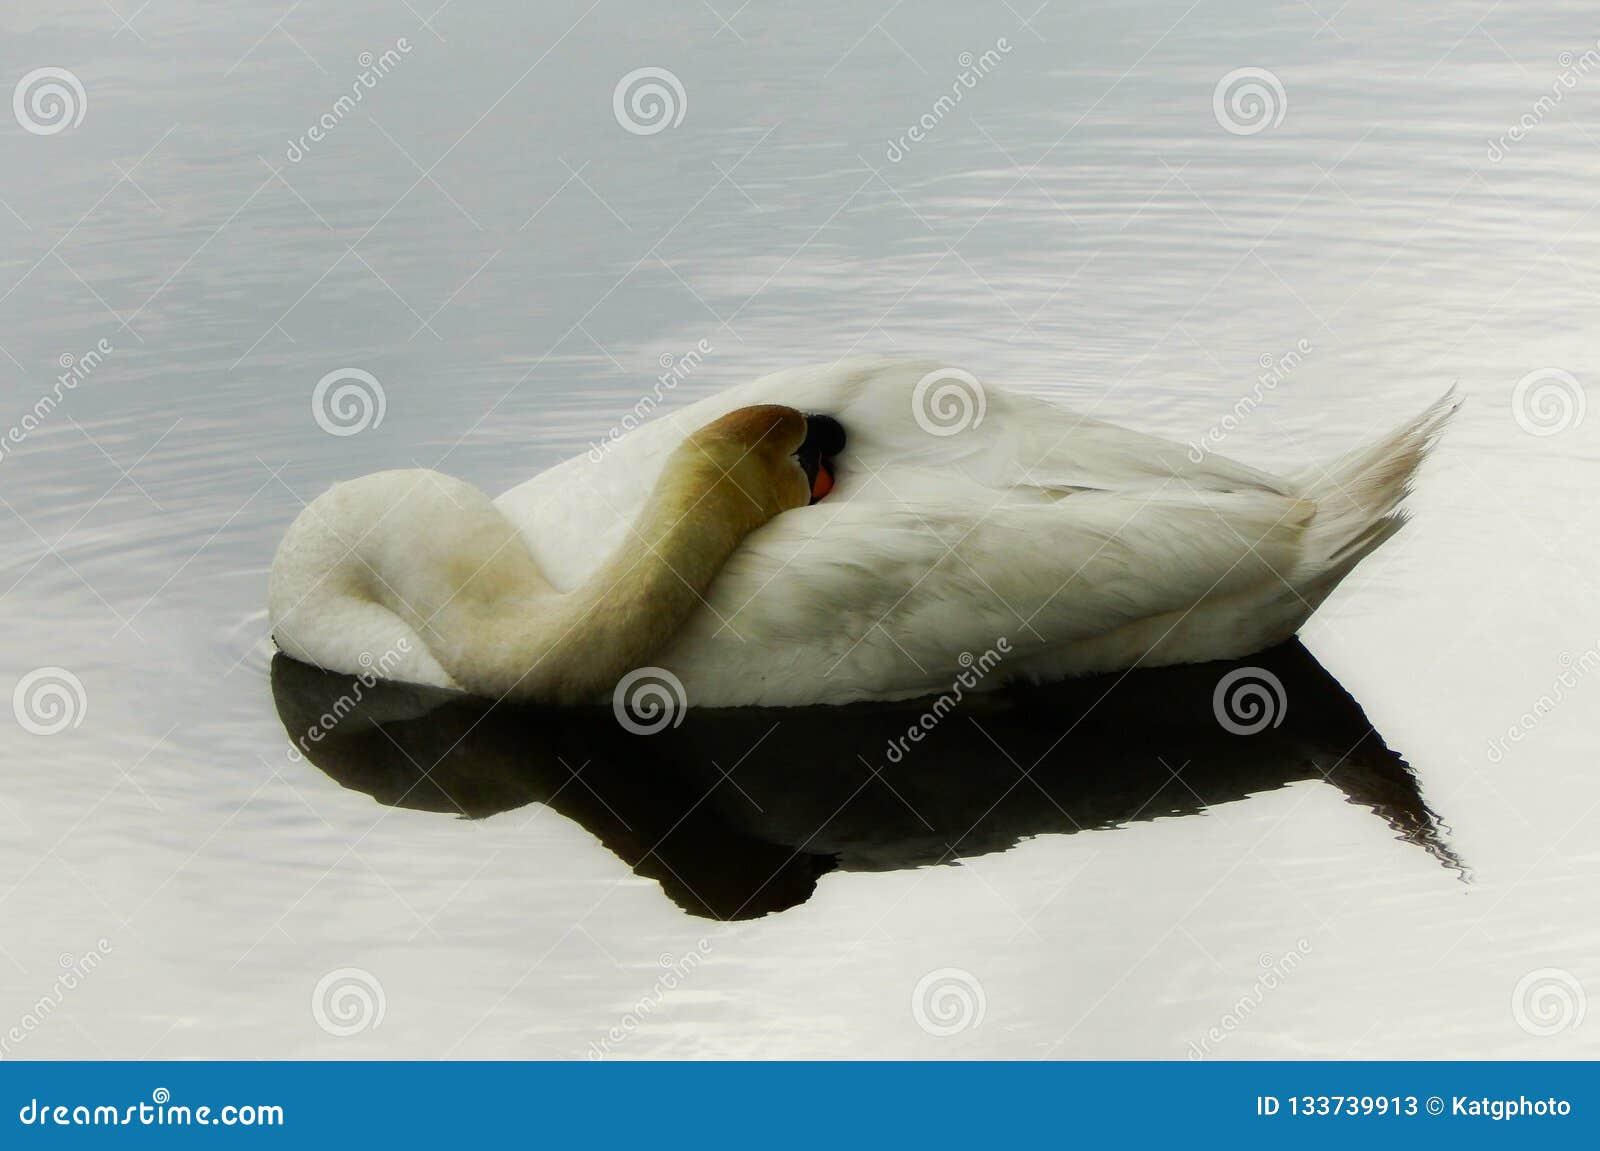 Mute Swan Sleeping On The Water